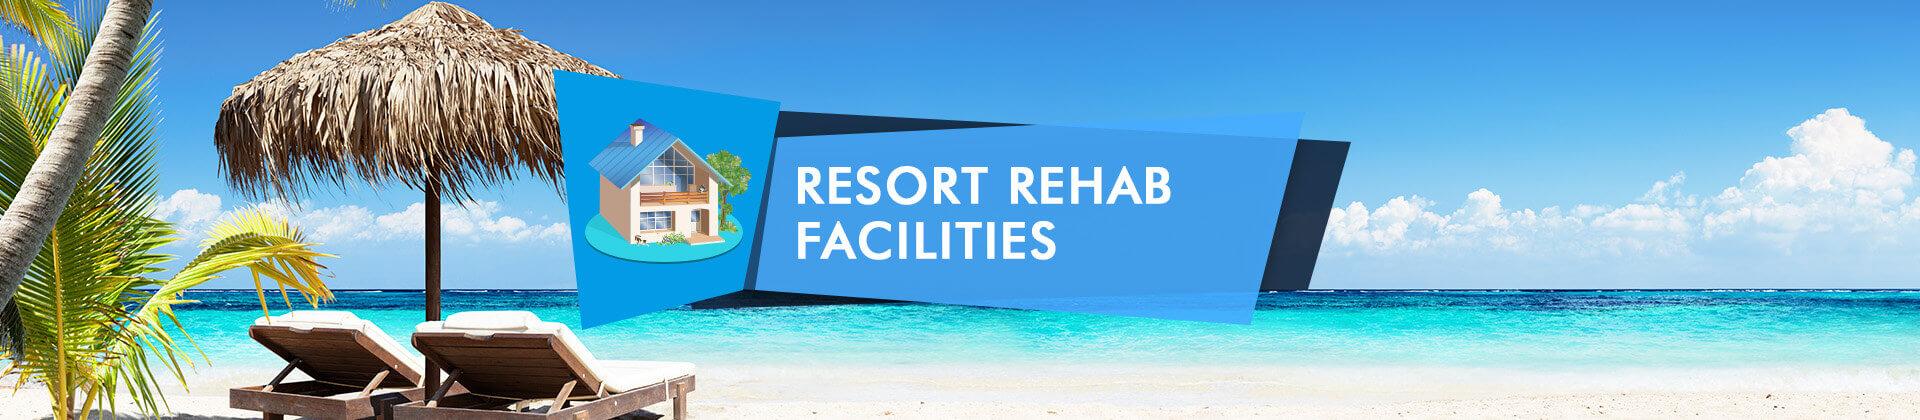 resort rehabilitation